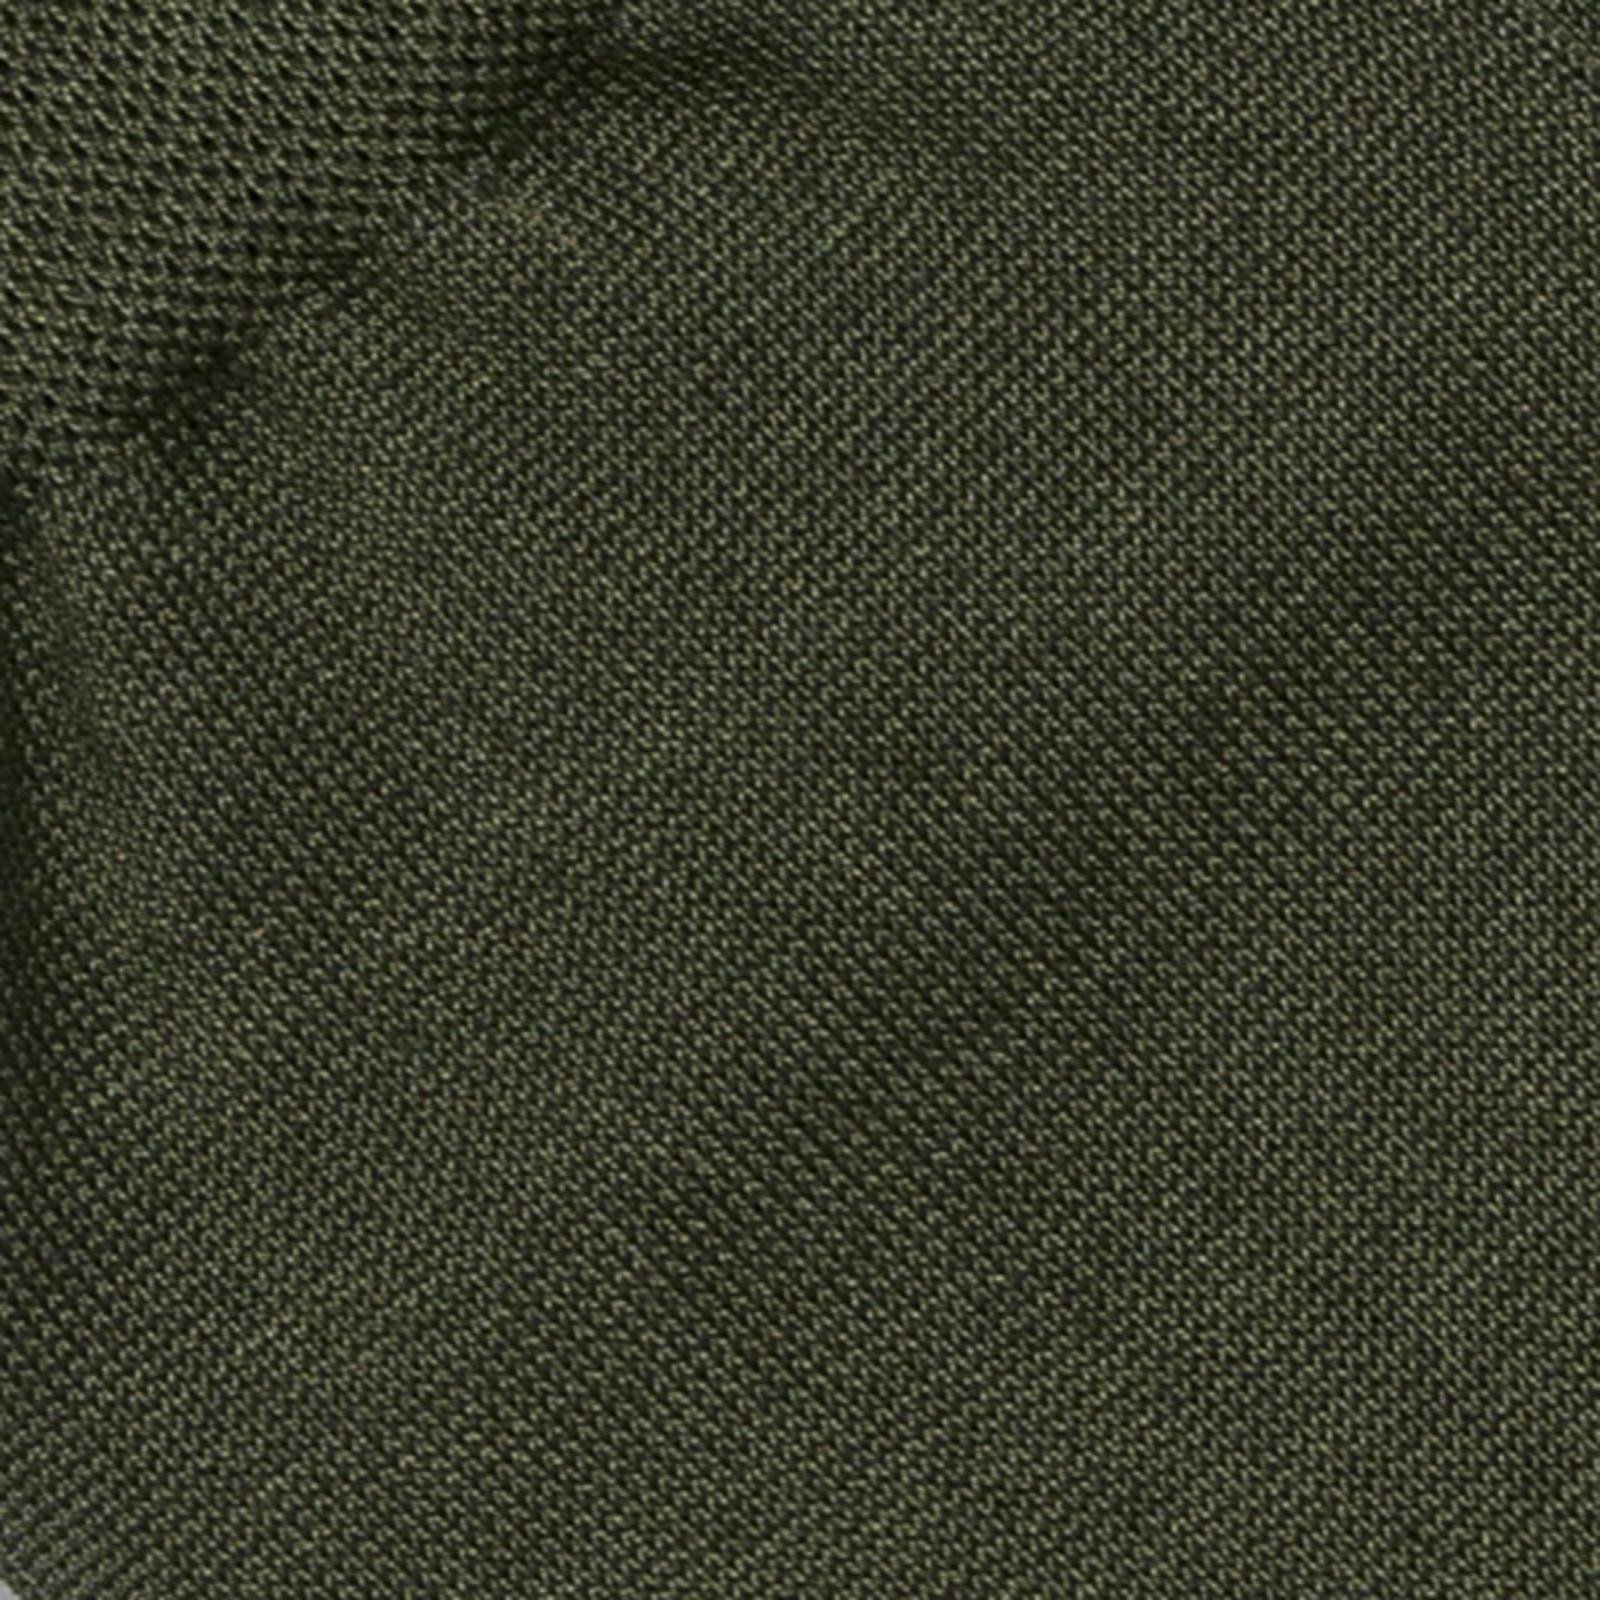 Carlo Lanza Olive cotton socks